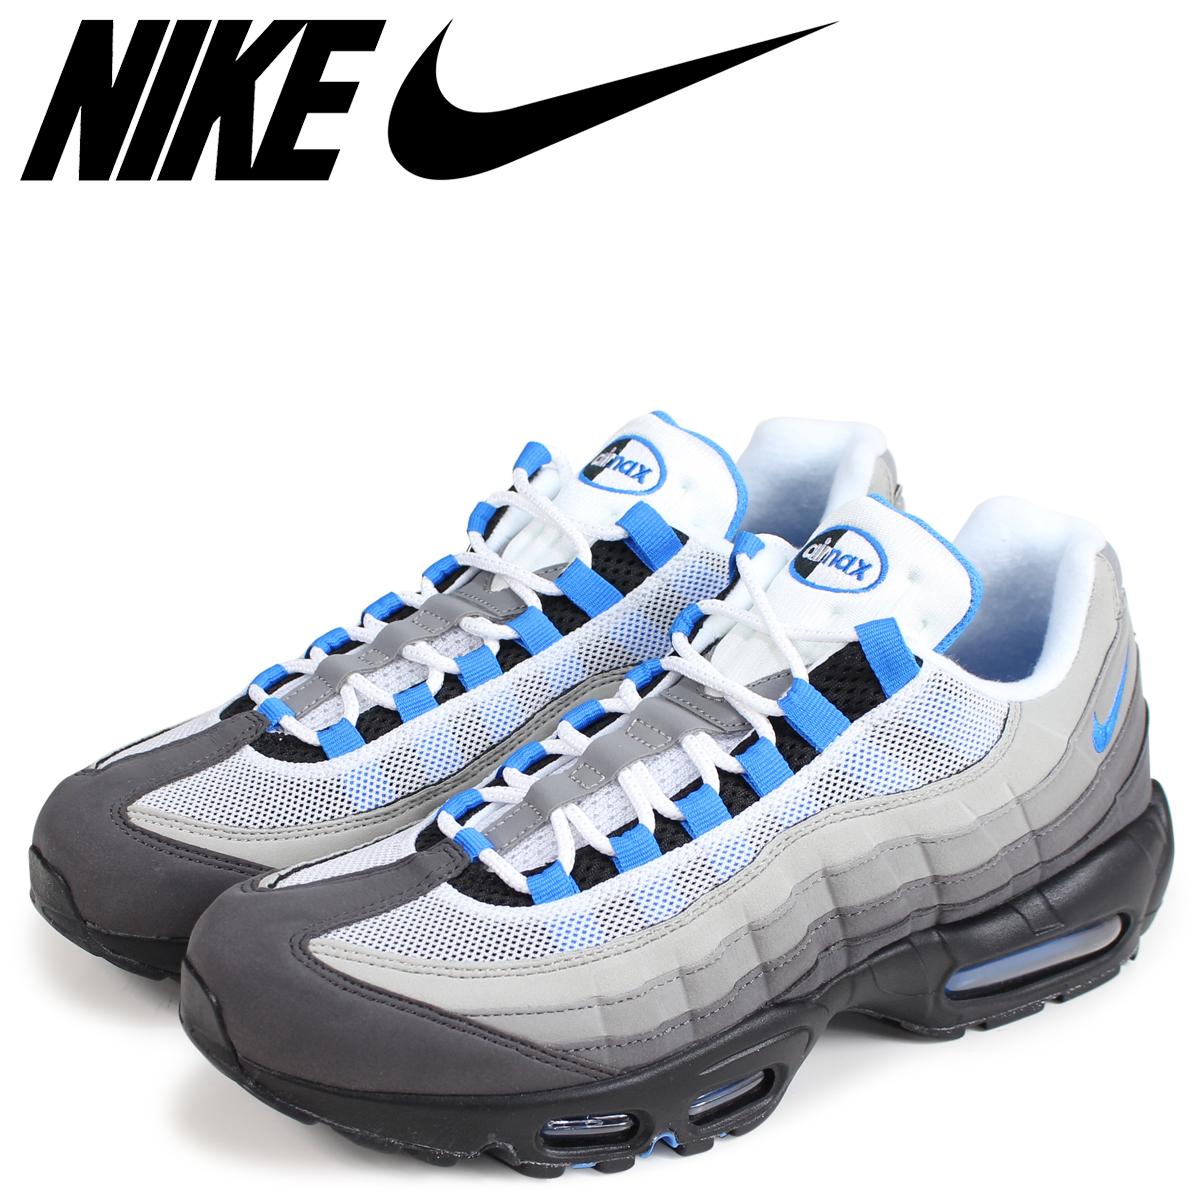 Sugar Online Shop  NIKE Kie Ney AMAX 95 sneakers men AIR MAX 95 gray  AT8696-100  2 12 reentry load   57666c375